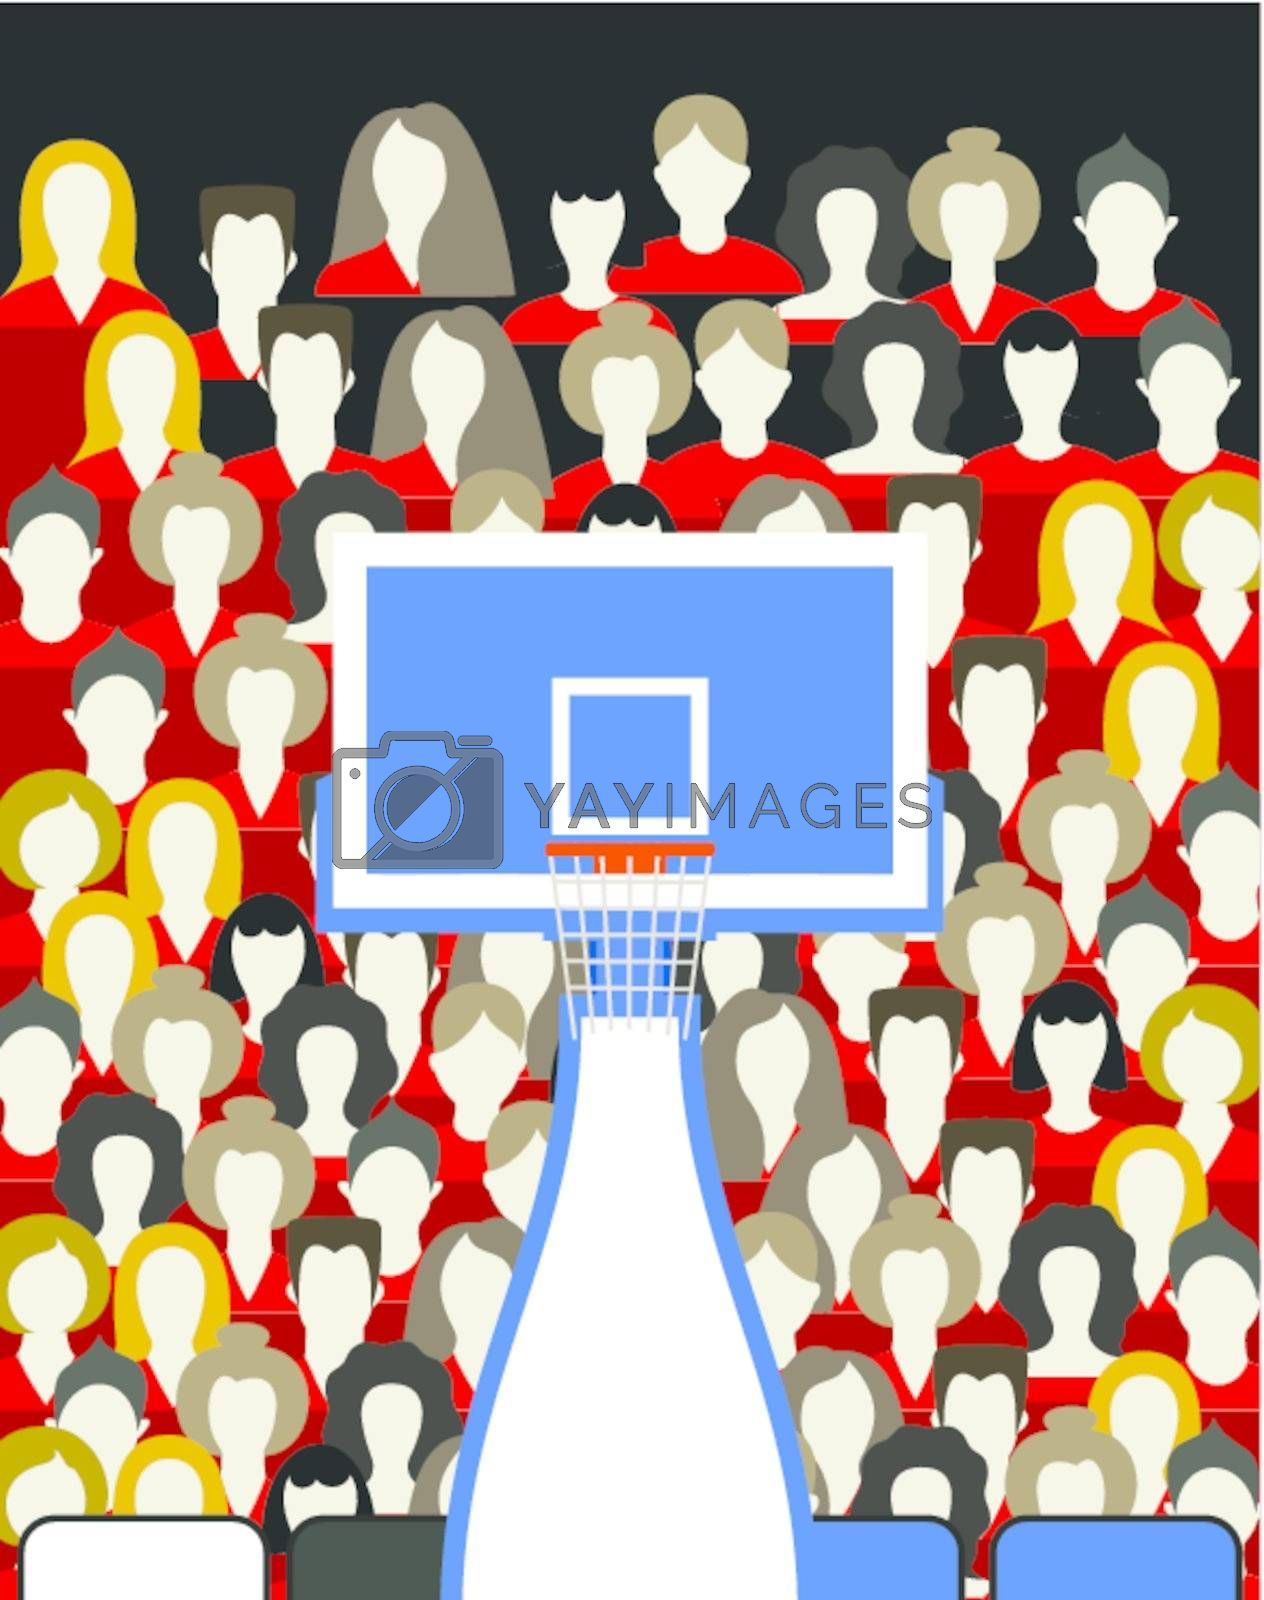 Royalty free image of Basketball by aleksander1